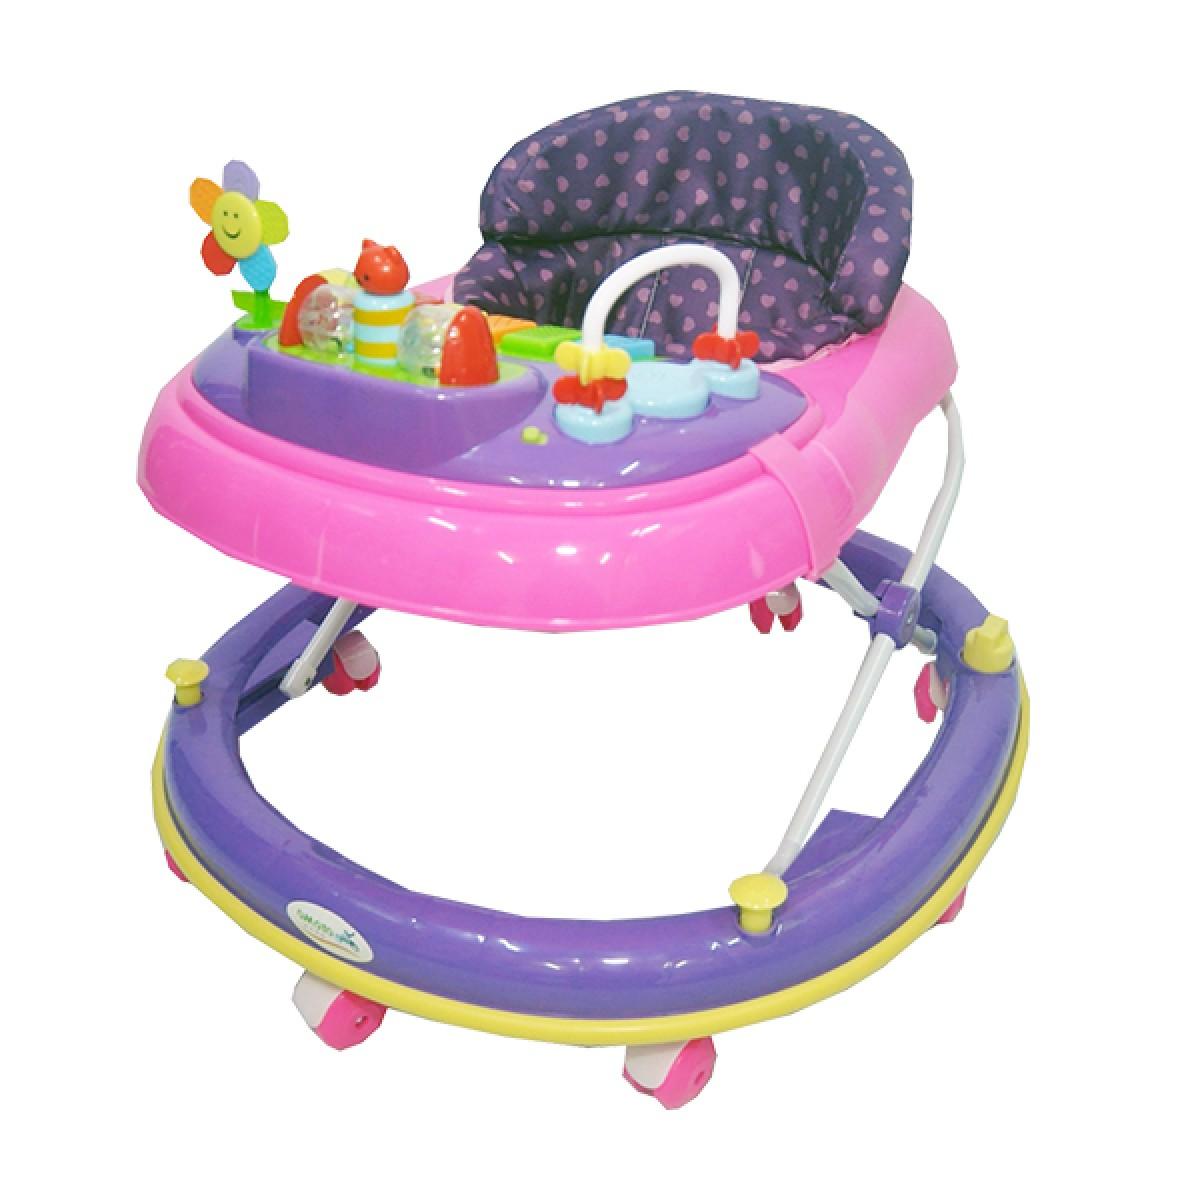 BABY WALKER - Kico Baby Center